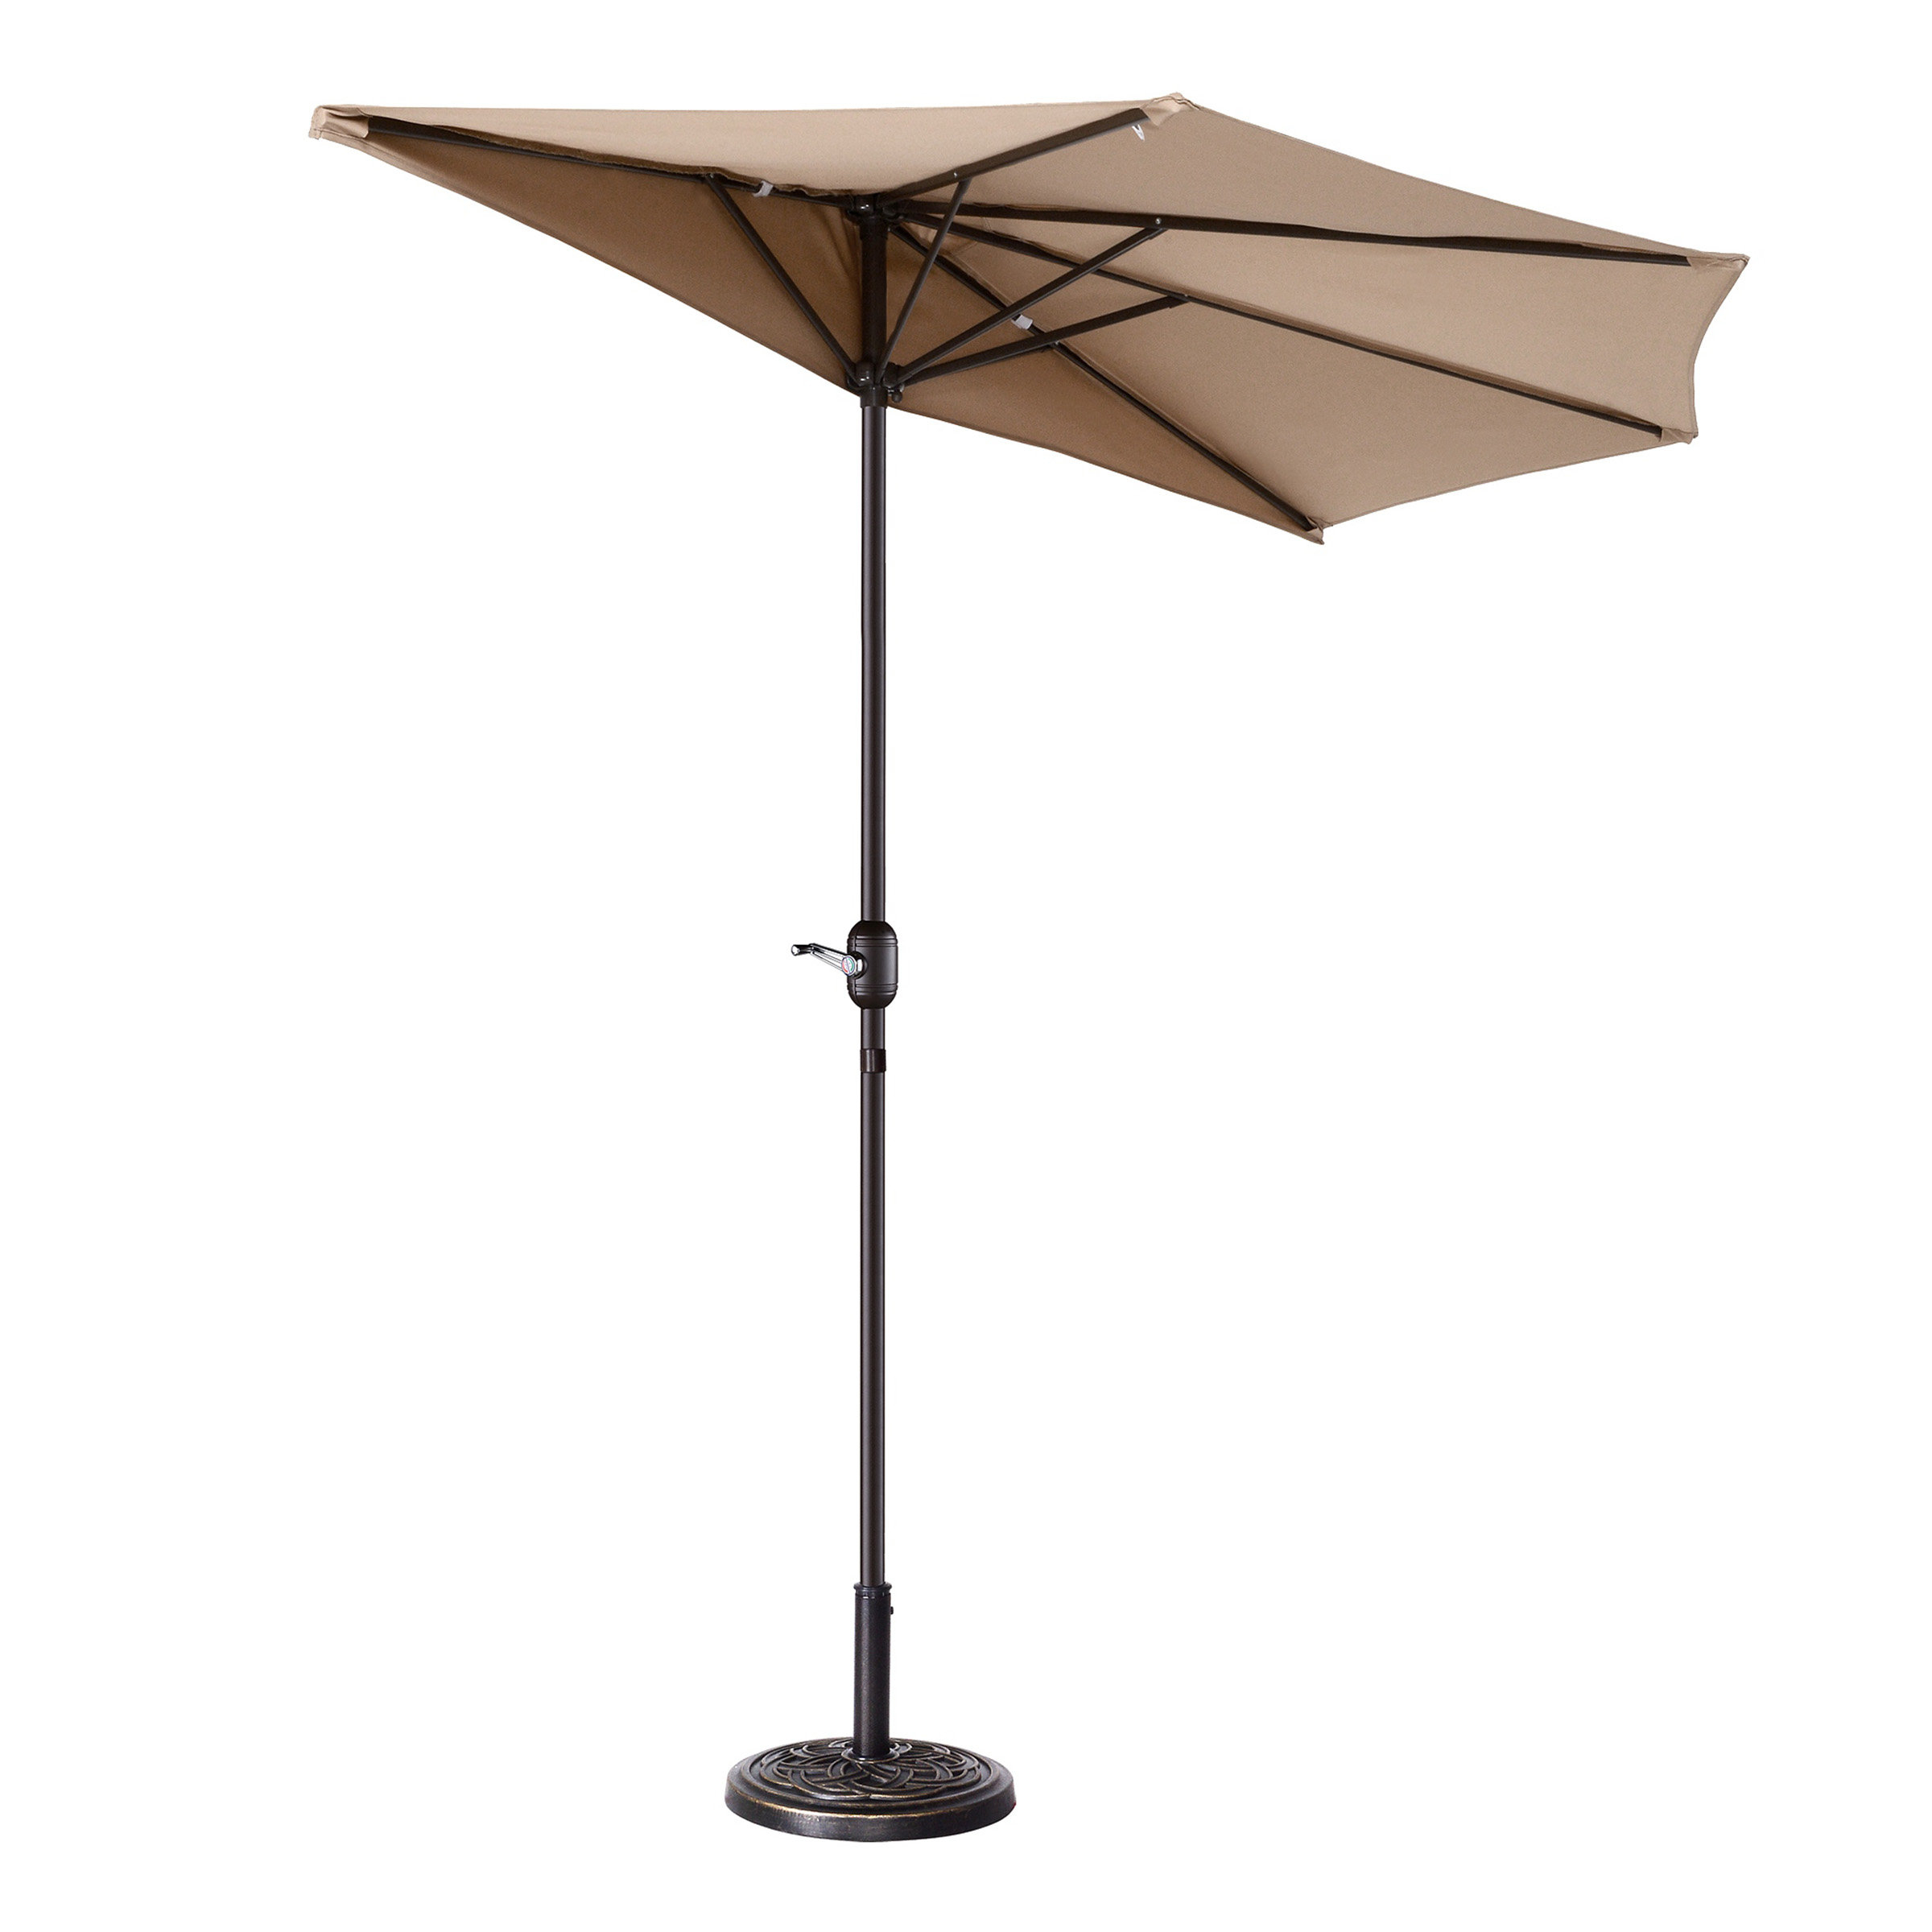 Popular Colburn Half 9' Market Umbrella Throughout Alder Half Round Outdoor Patio Market Umbrellas (View 5 of 20)